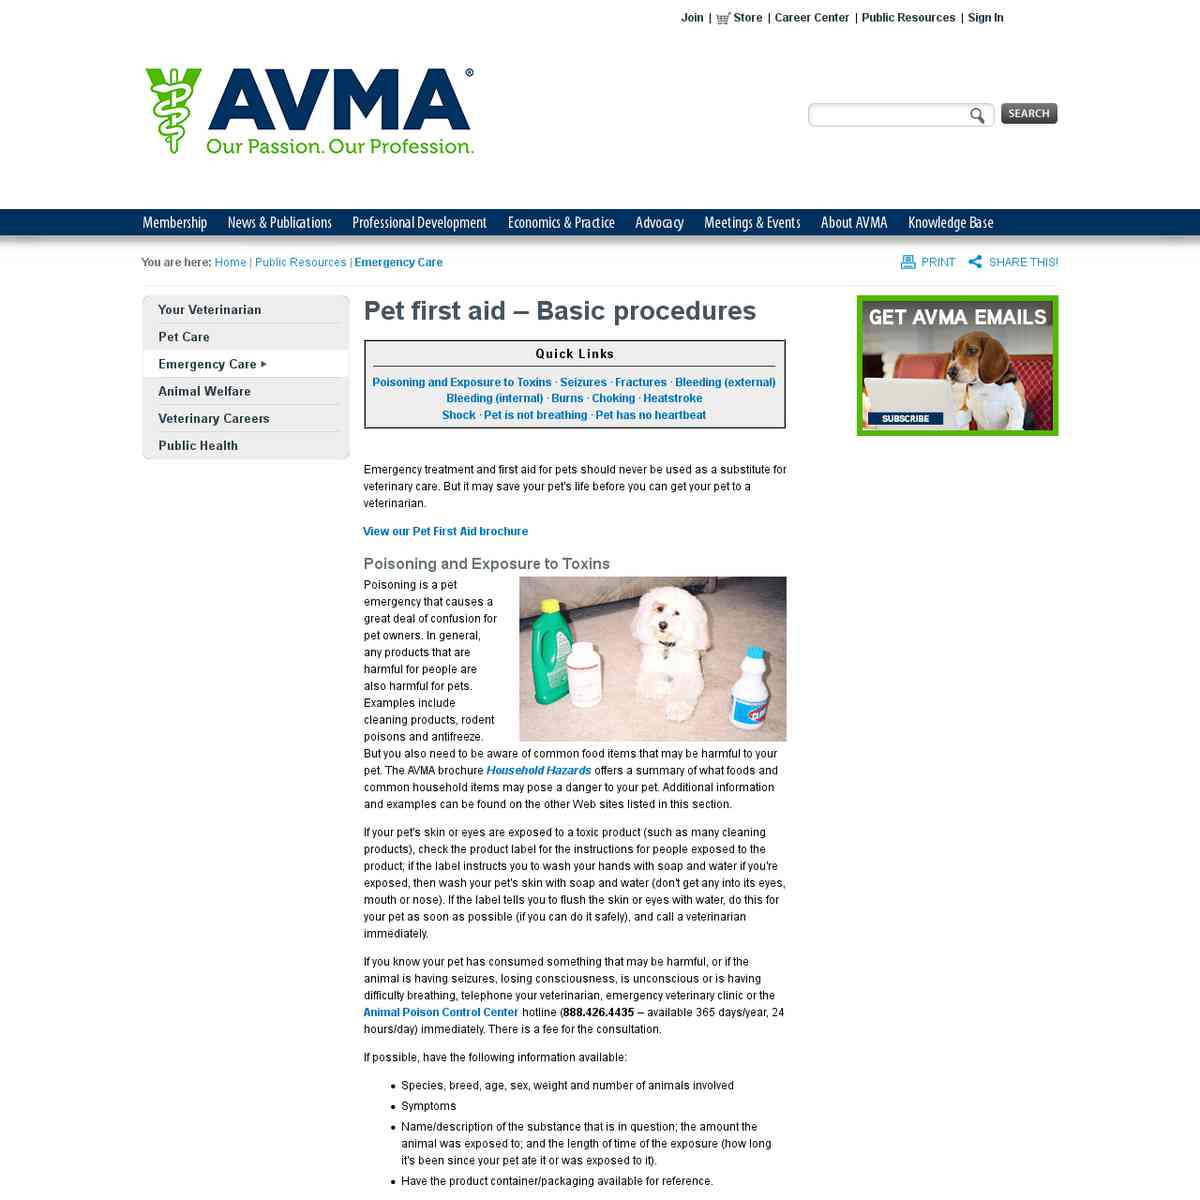 AVMA: Basic Pet First Aid Procedures